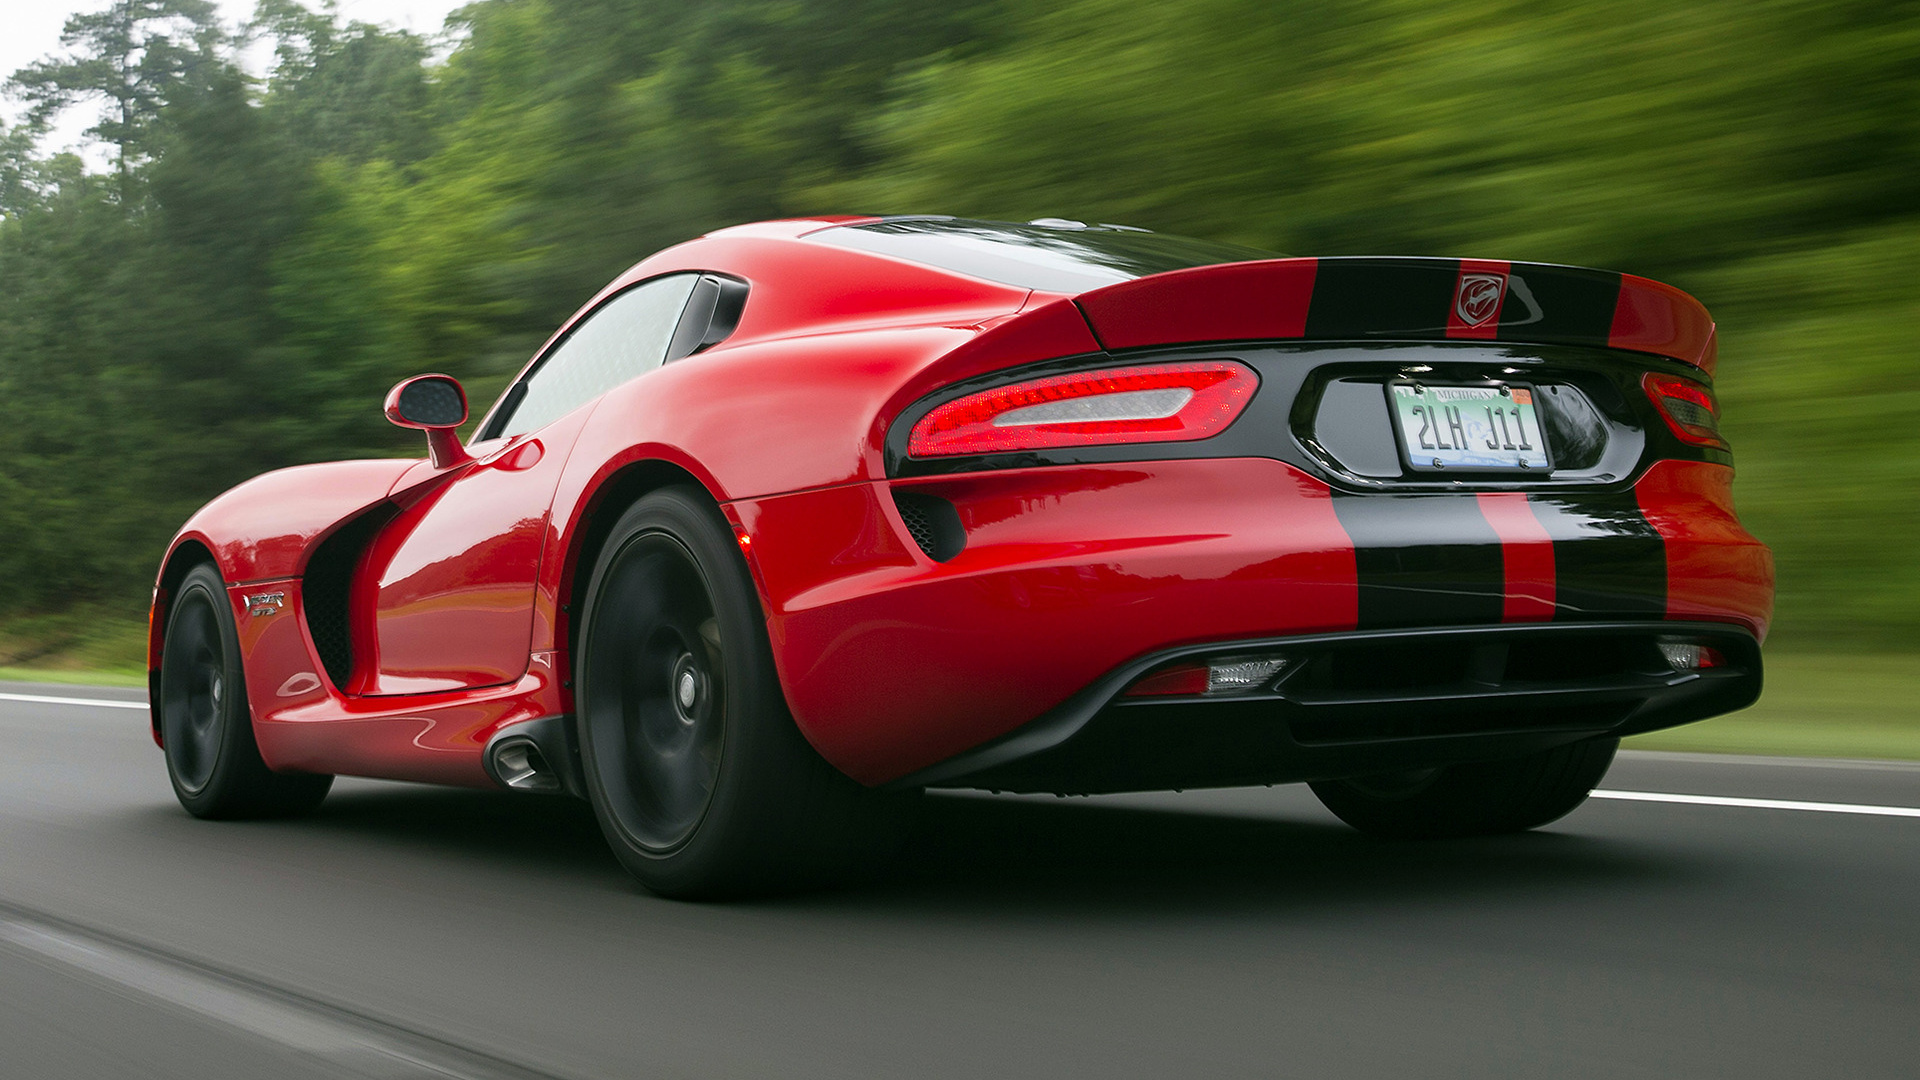 2015 Dodge Viper GTS - Wallpapers and HD Images   Car Pixel